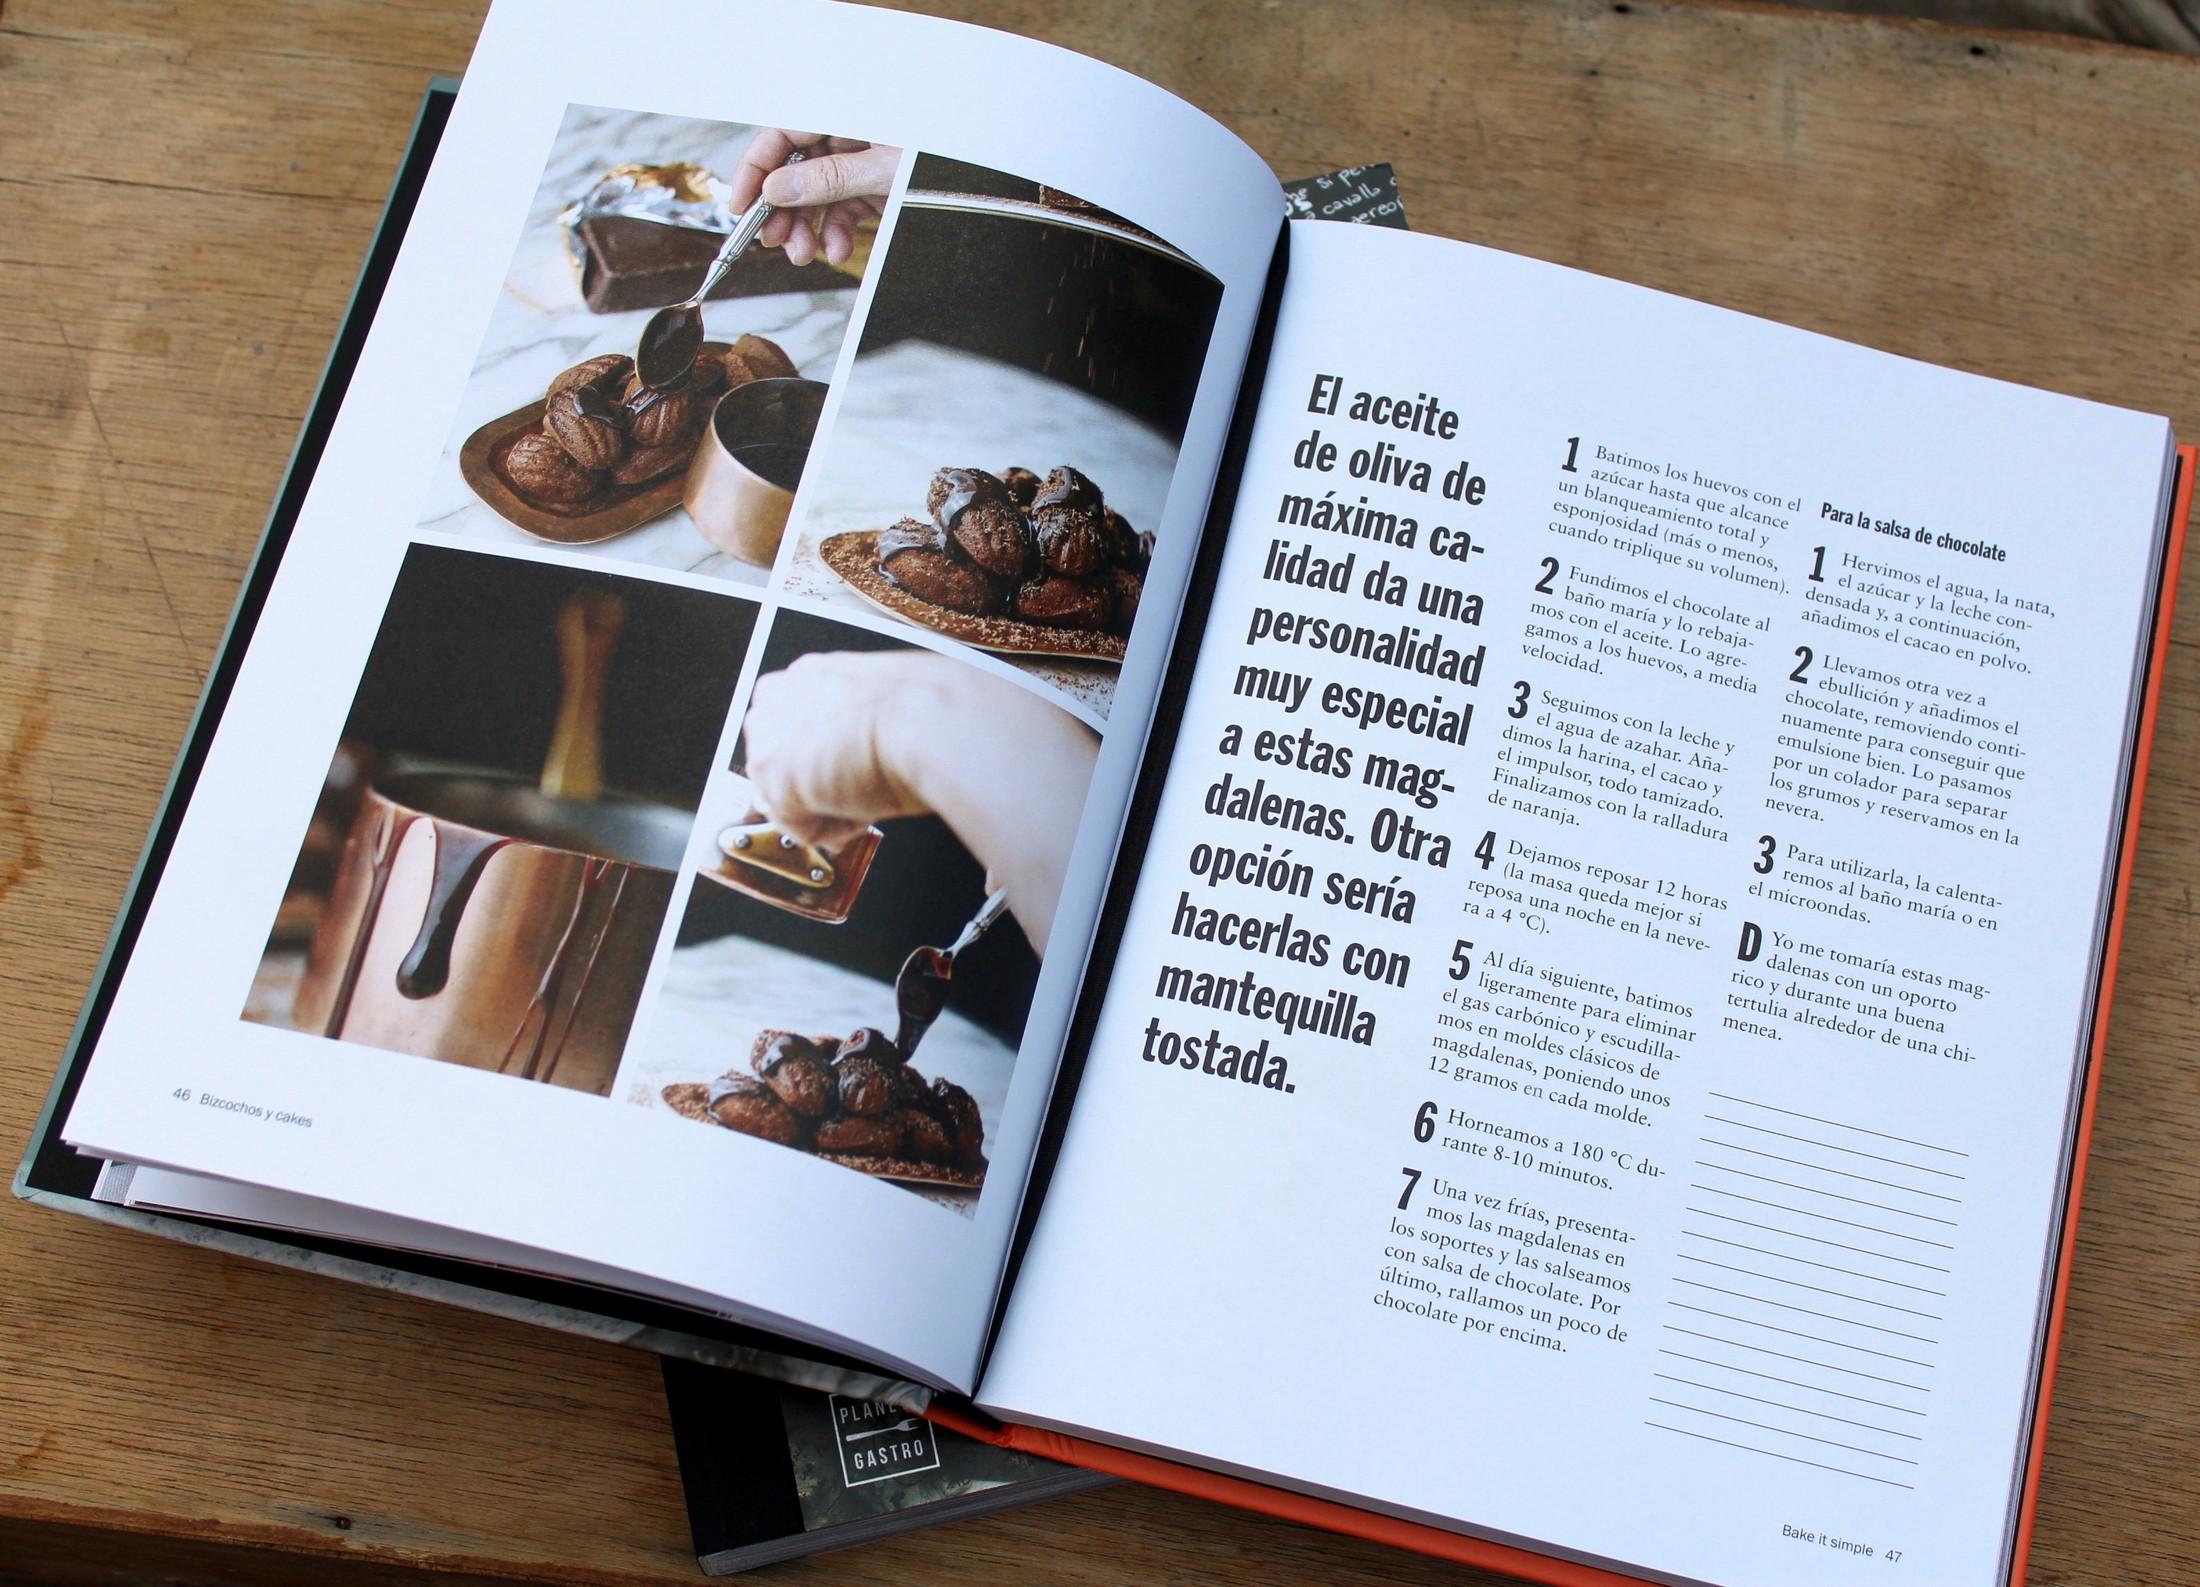 Bake it simple, recetas fáciles de pastelería de Oriol Balaguer